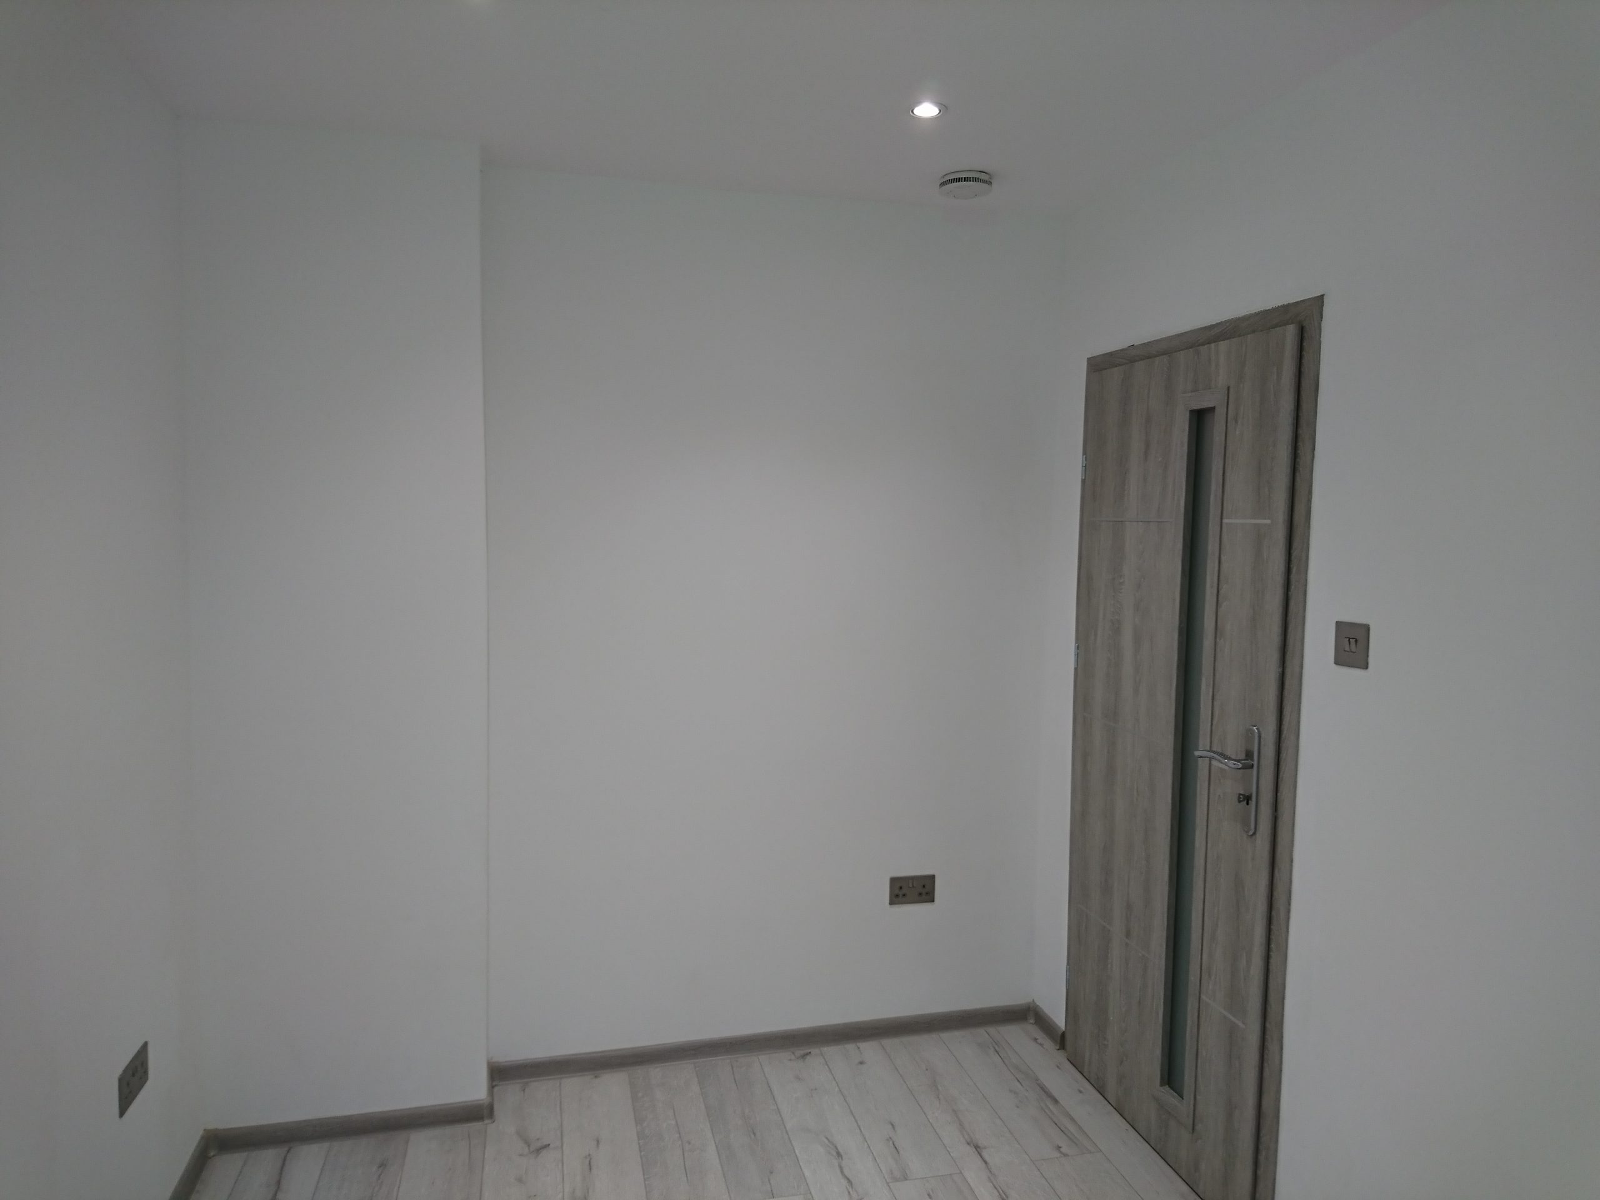 insulation-installation-edinburgh-insulation-systems-edinburgh